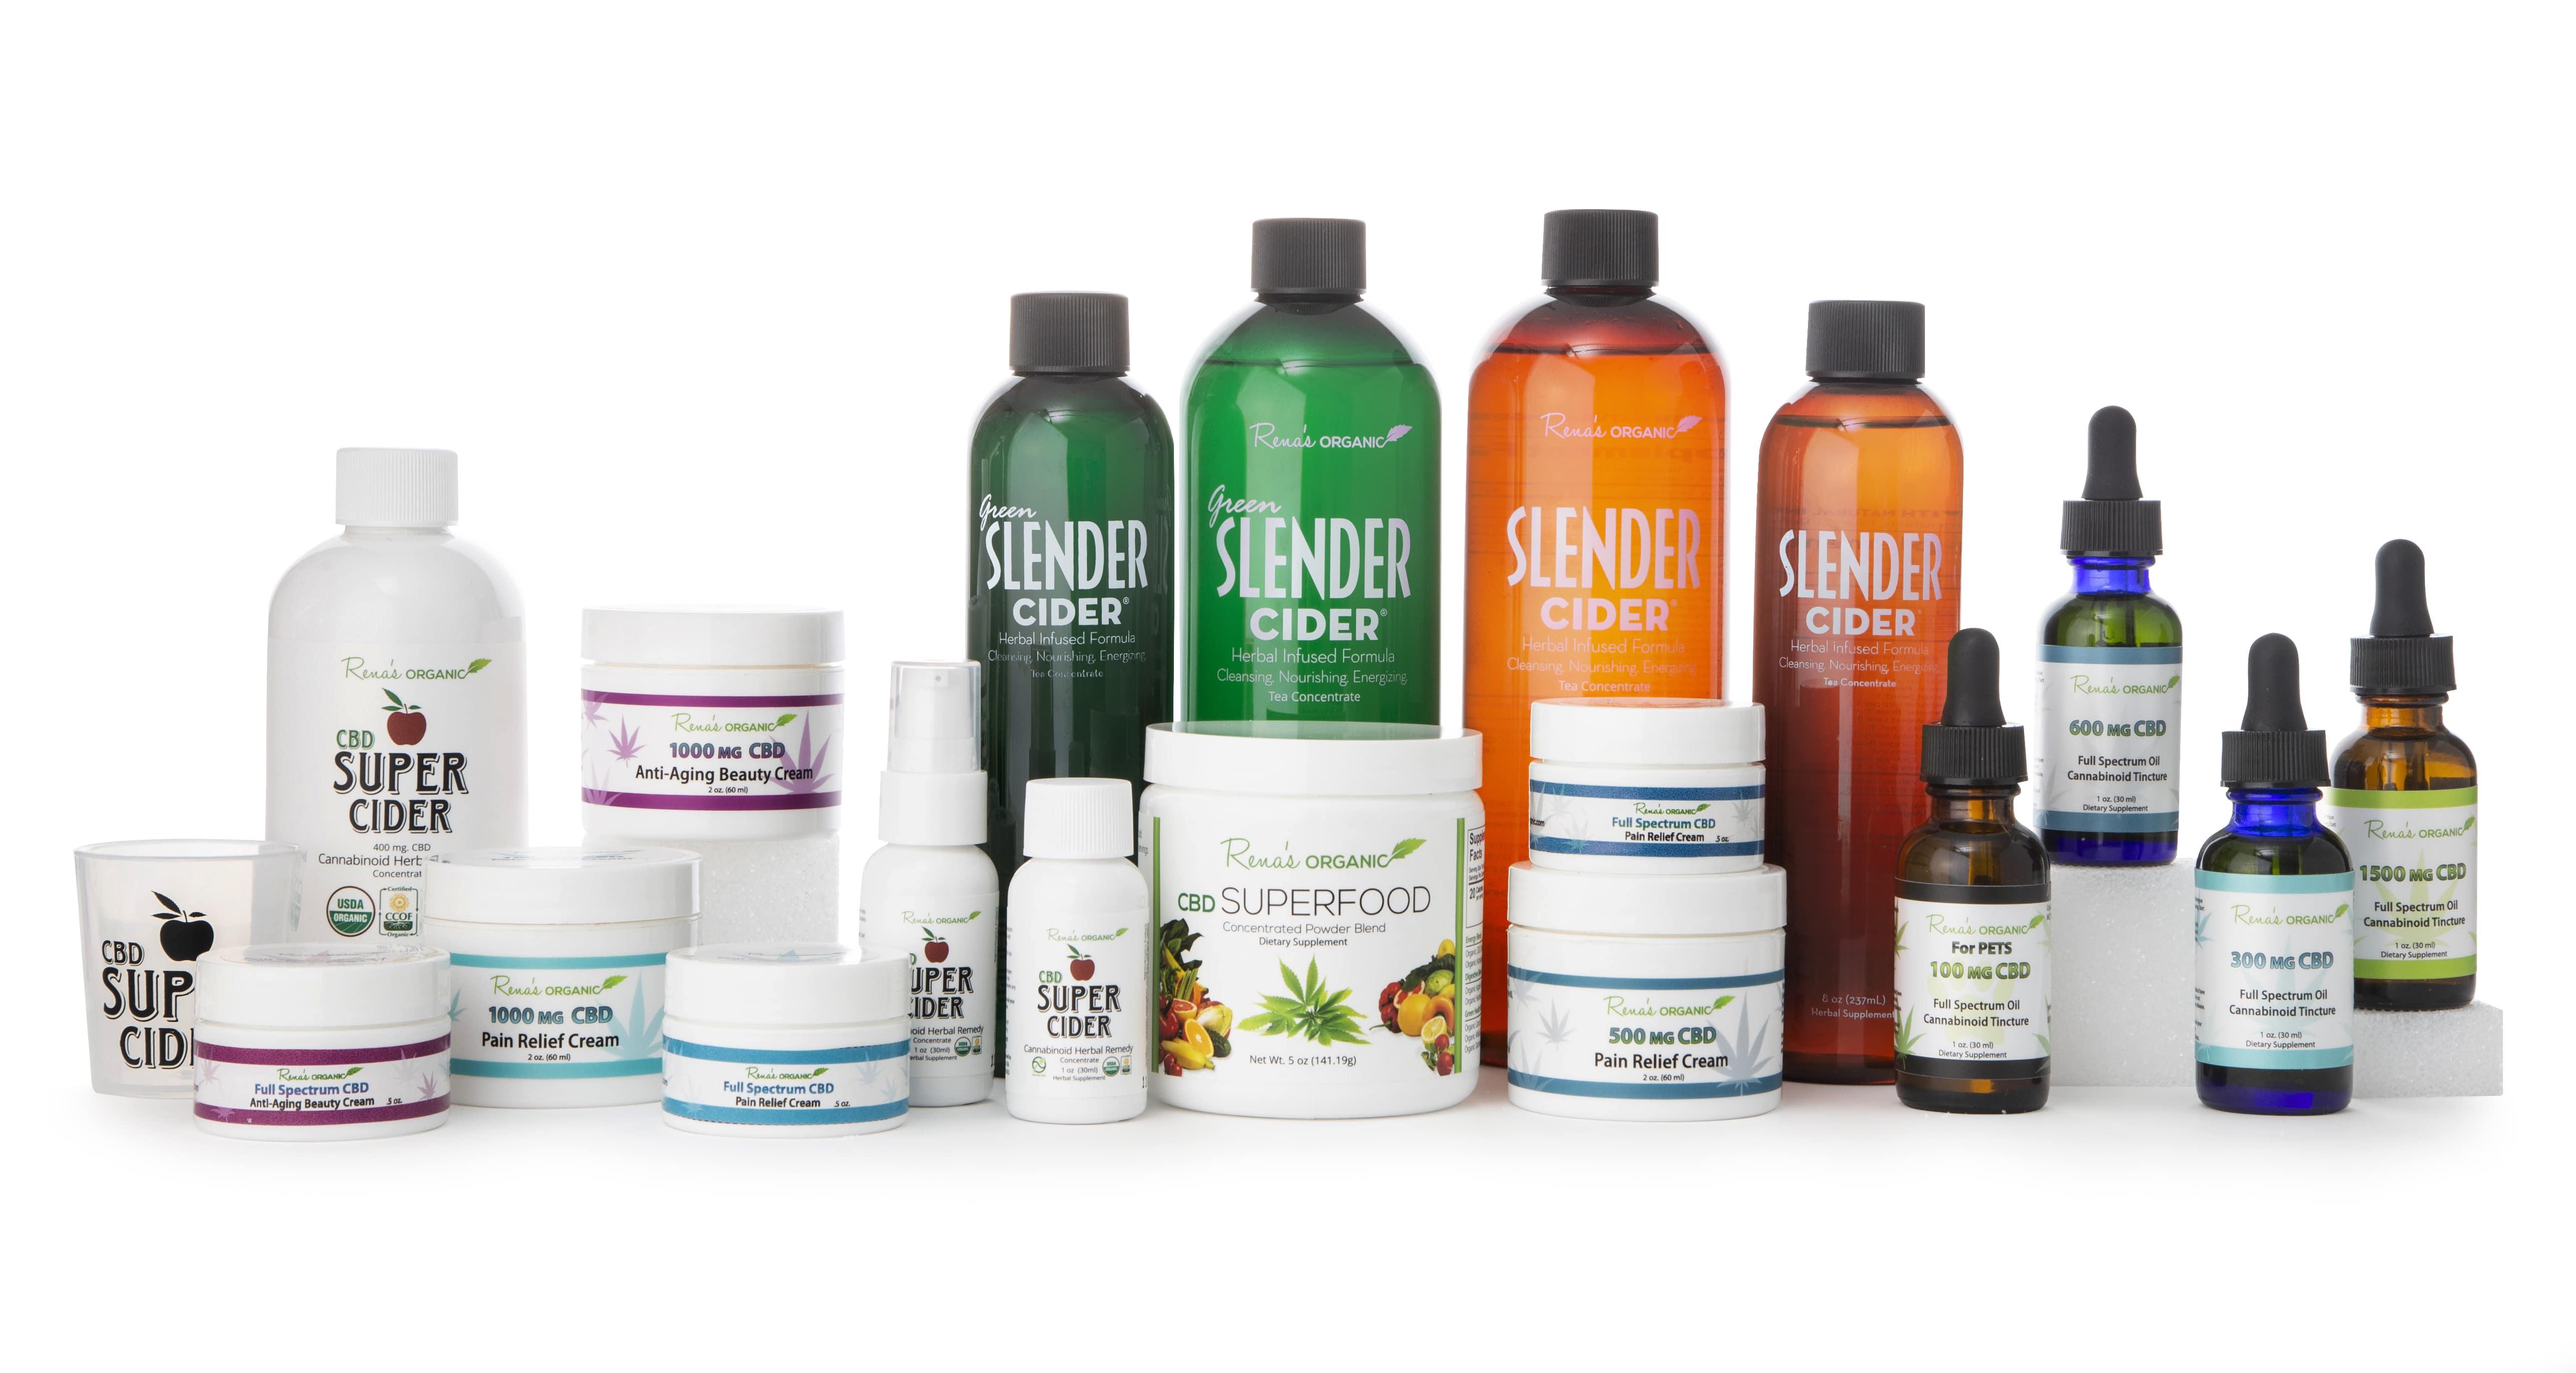 Rena's Organic CBD product line